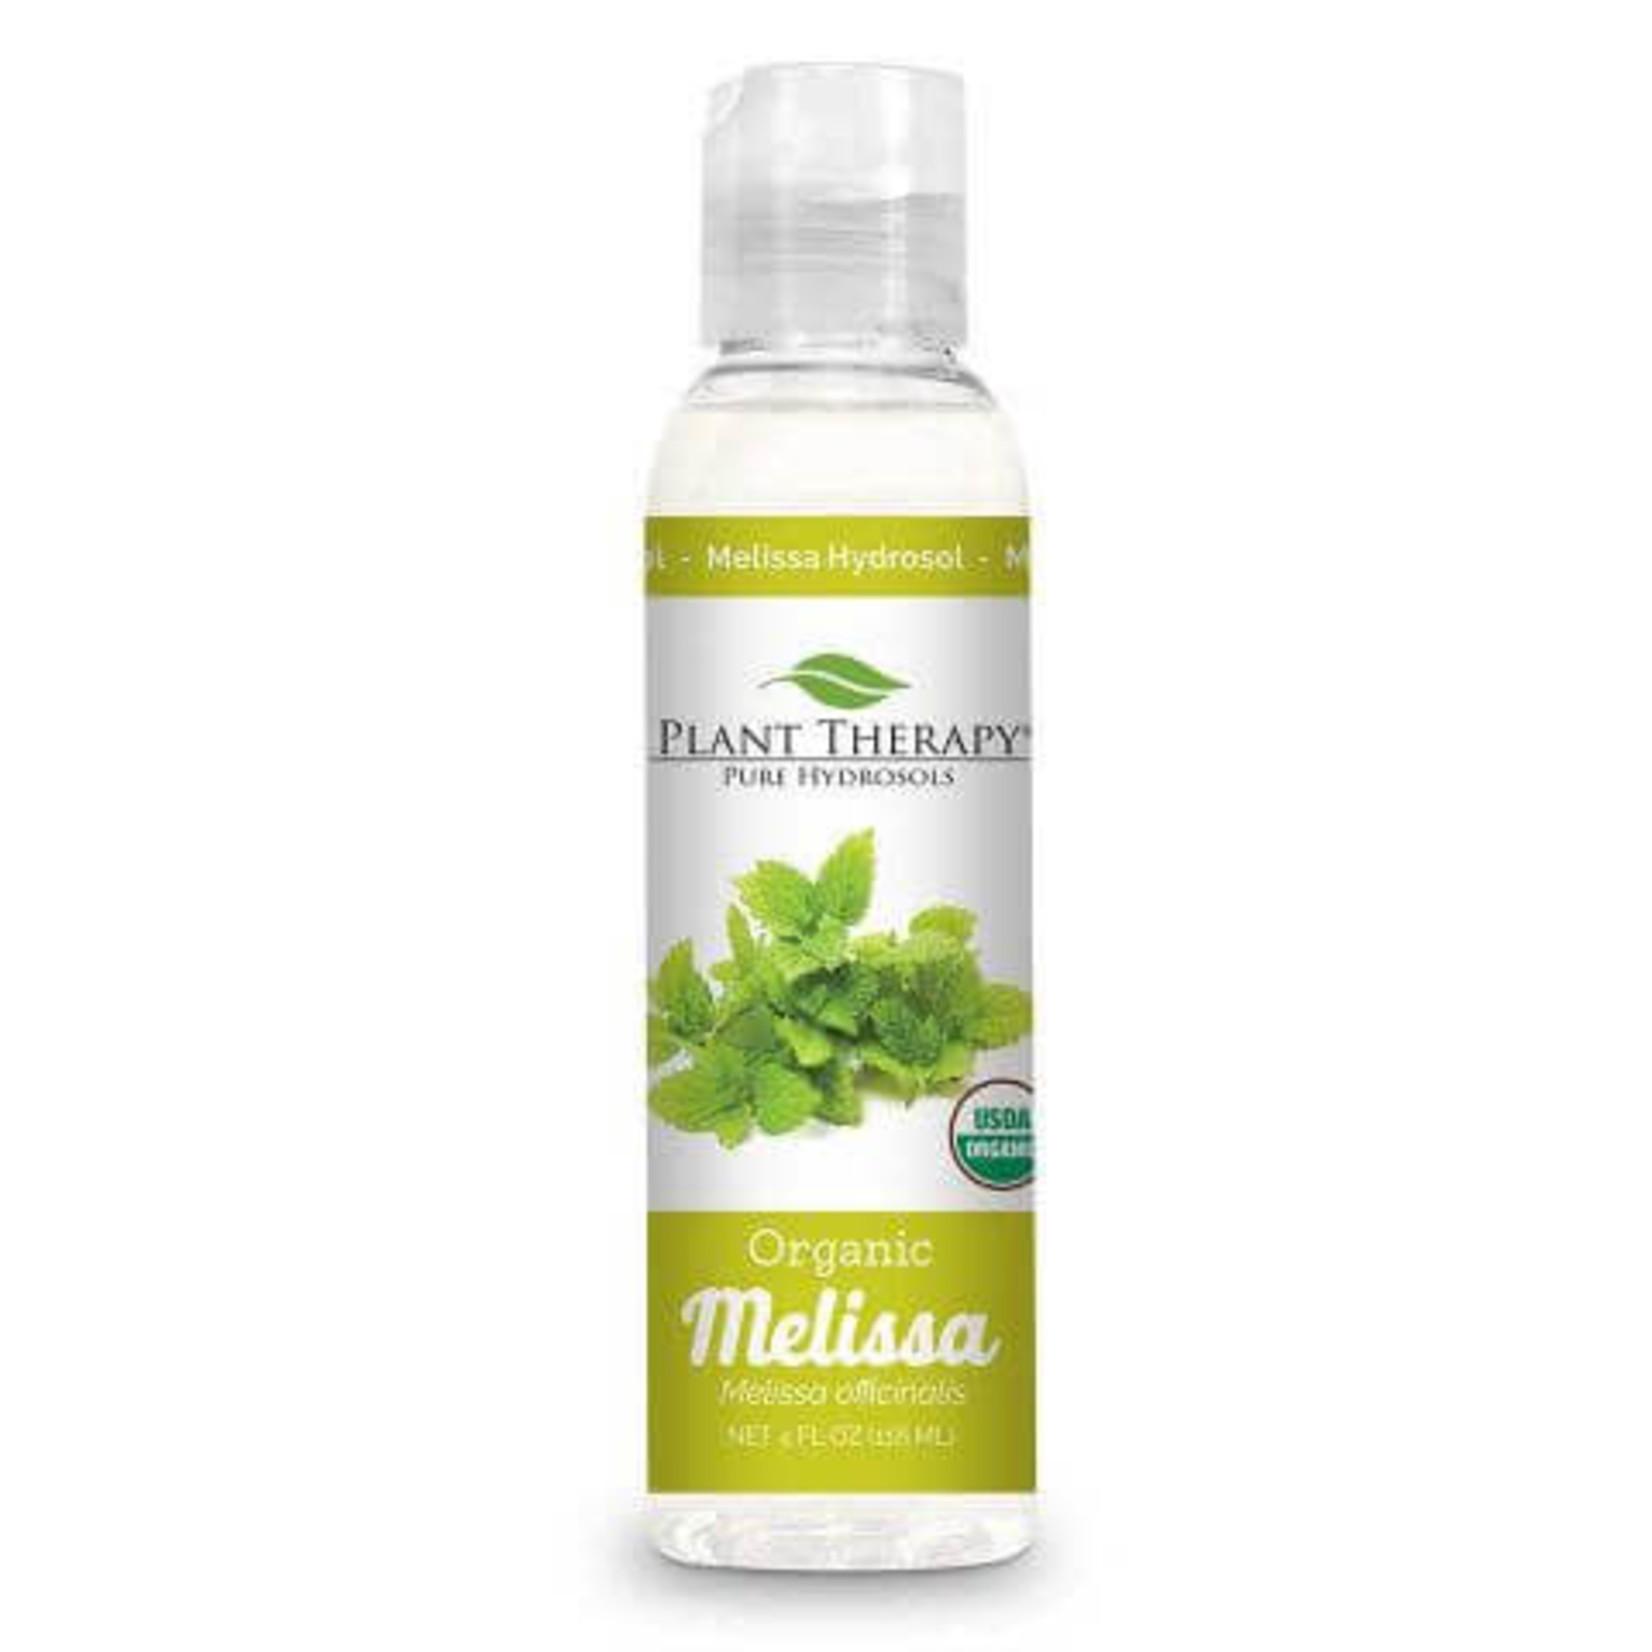 Plant Therapy PT Organic Melissa Hydrosol 4oz